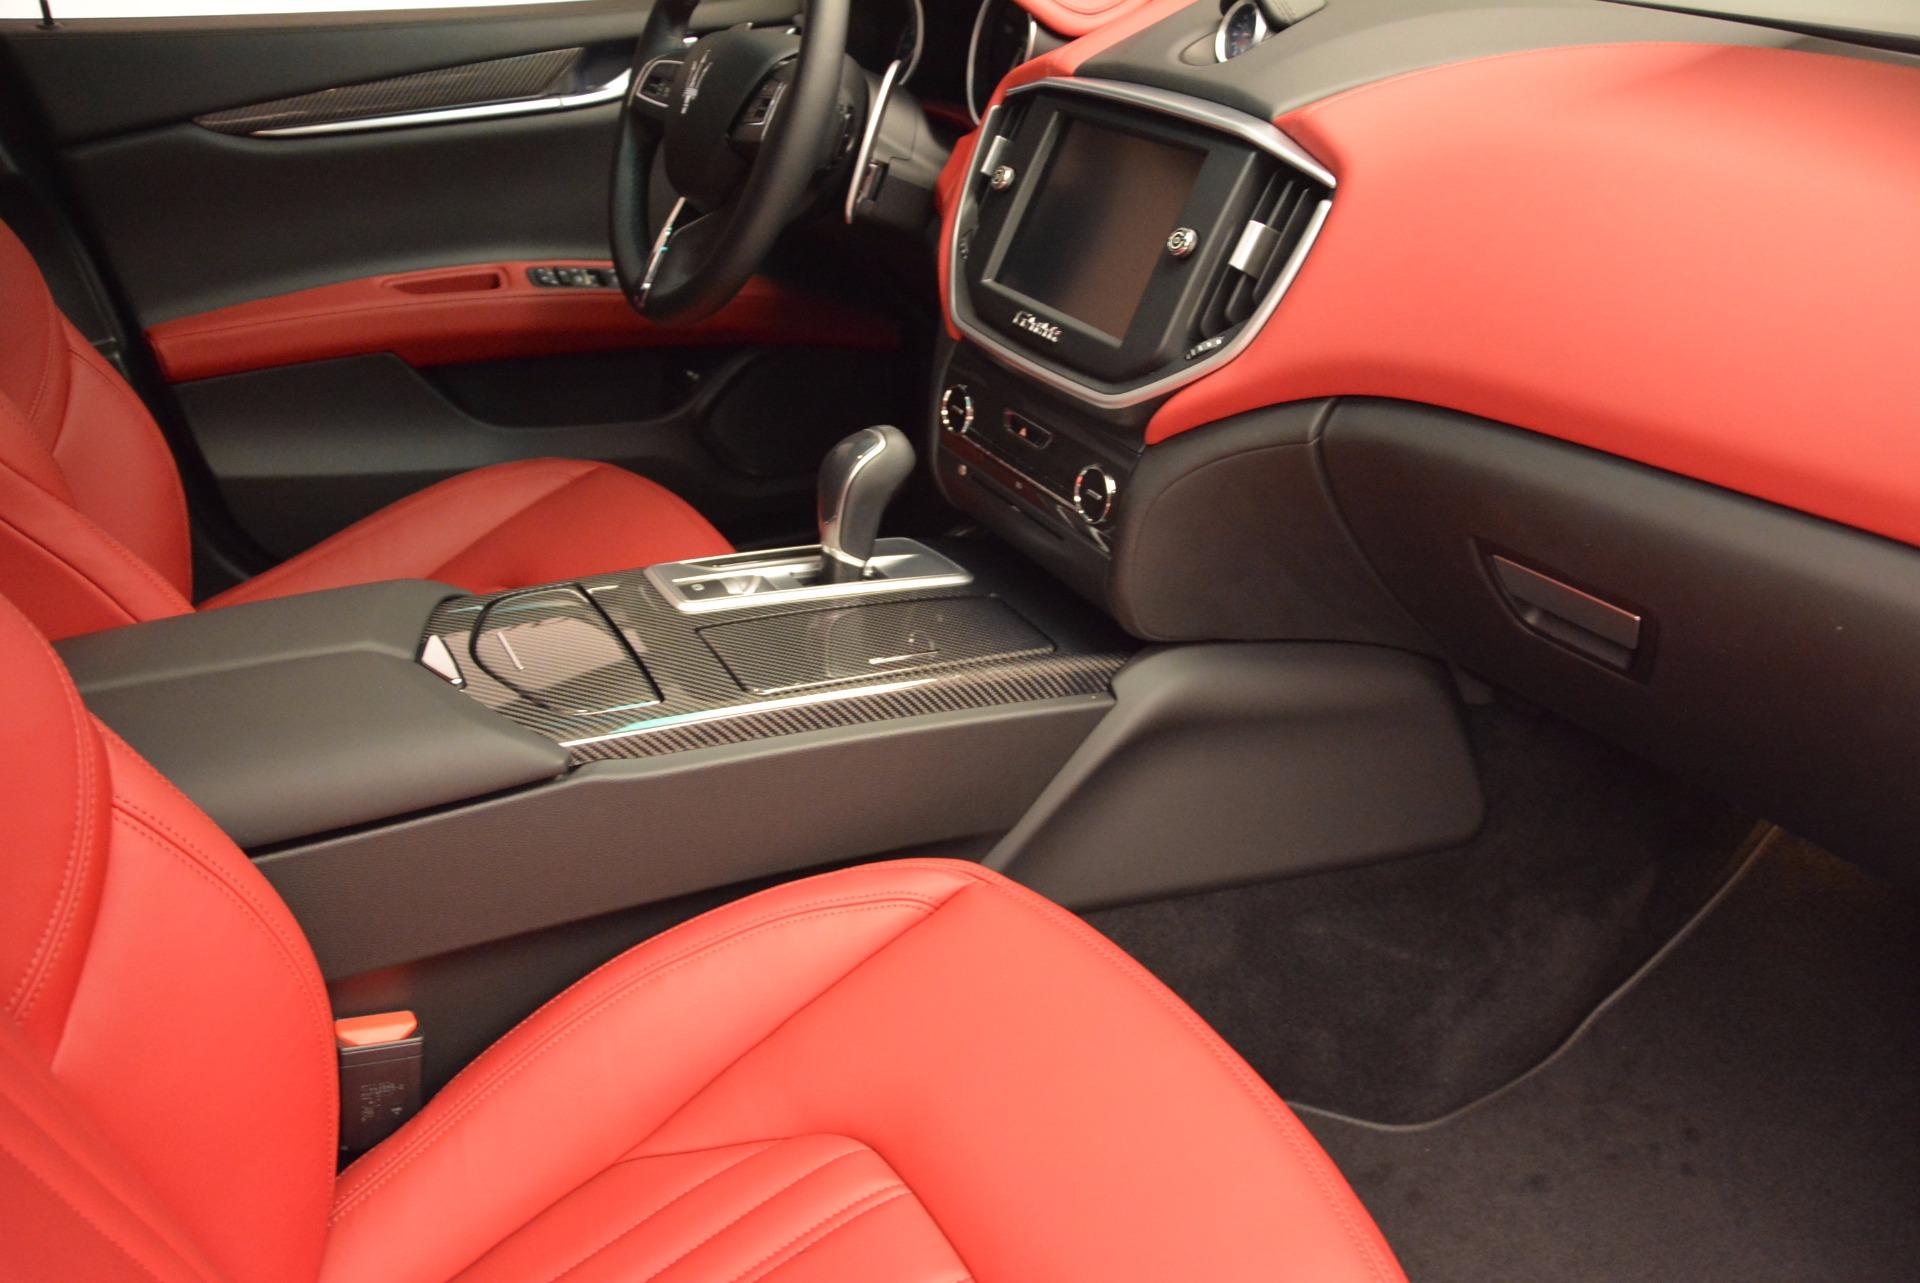 Used 2015 Maserati Ghibli S Q4 For Sale In Westport, CT 1290_p20